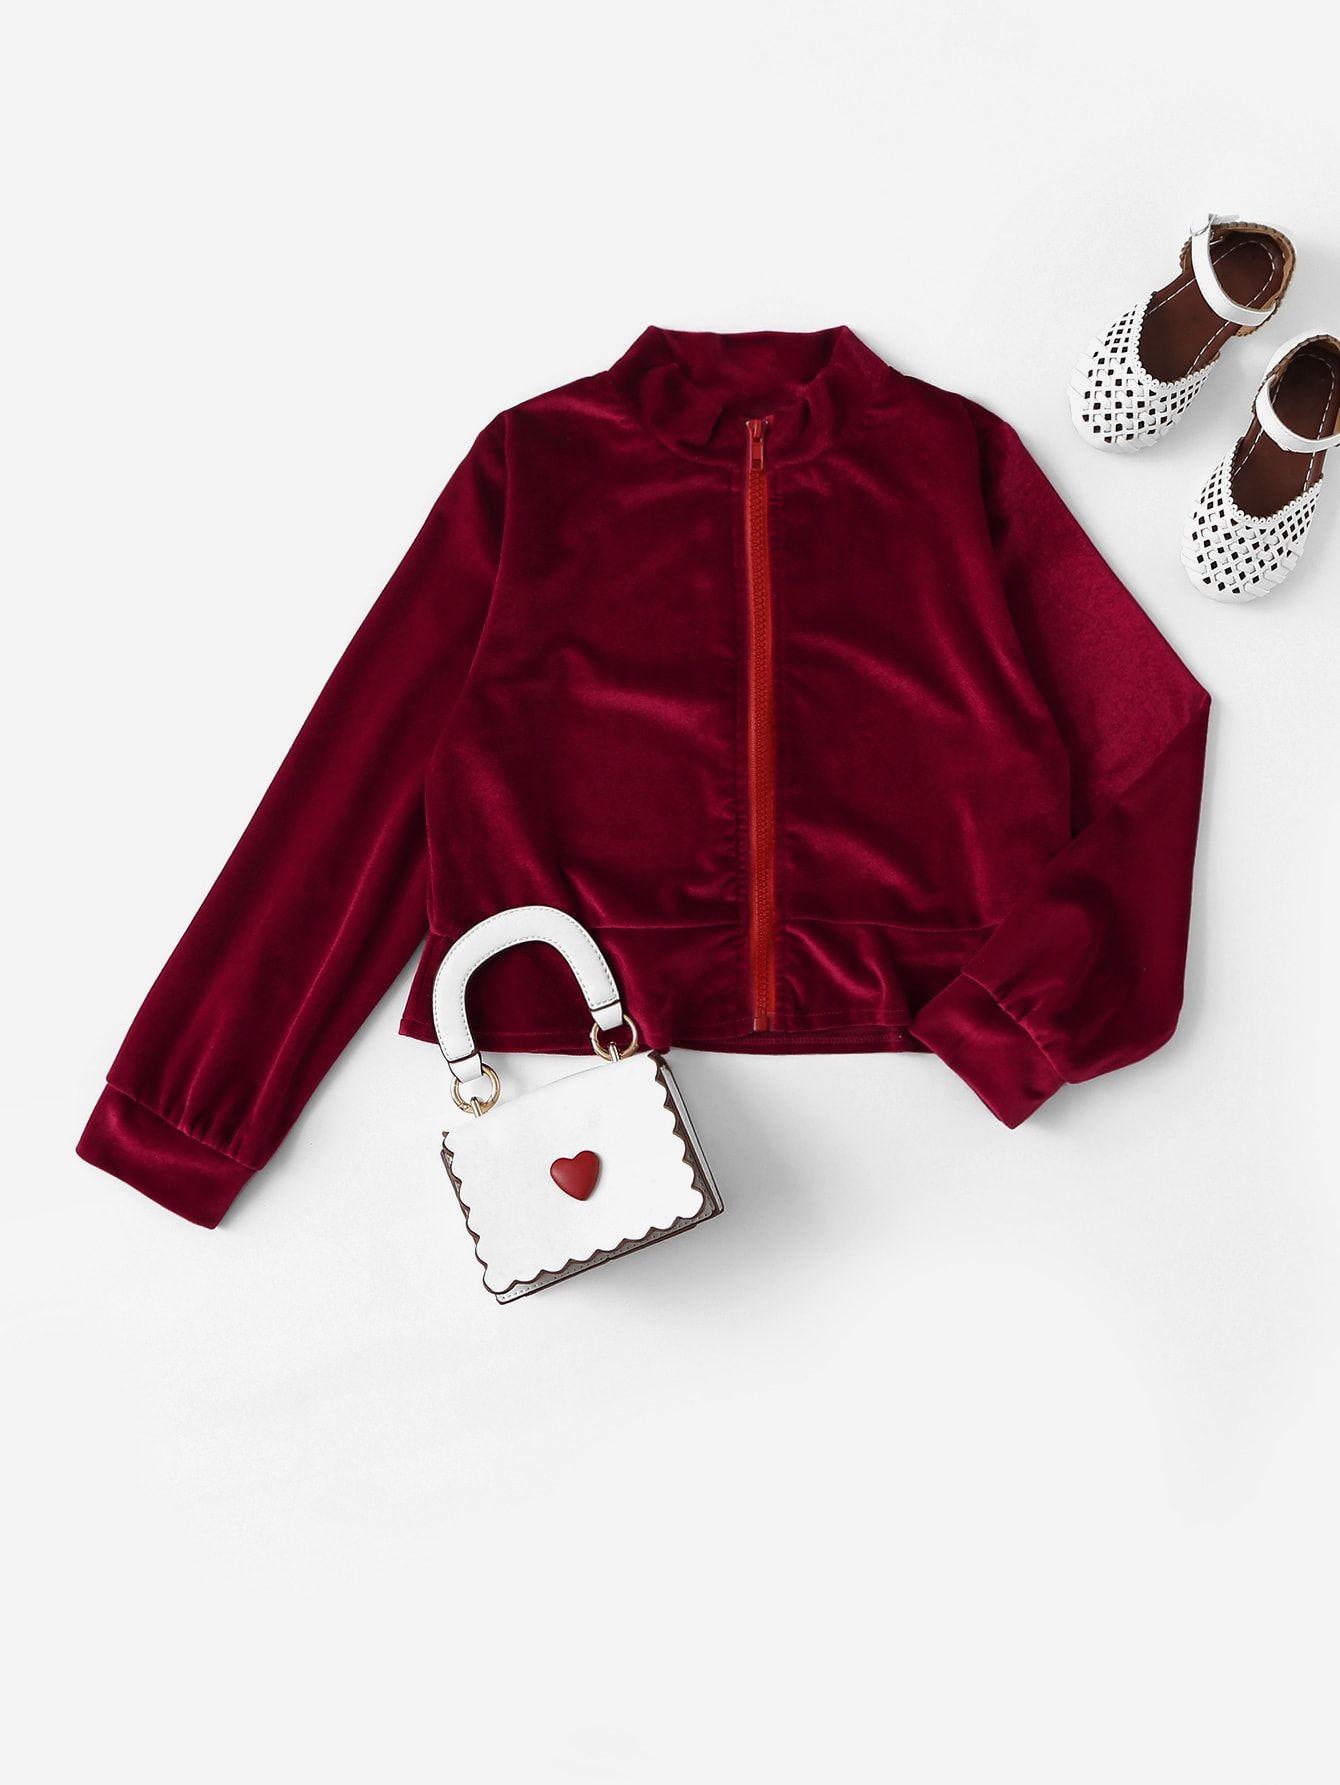 d1dc6ae82ee Girls Mock-neck Ruffle Hem Zipper Velvet Jacket #girl #ideas #fashion  #trend #moda